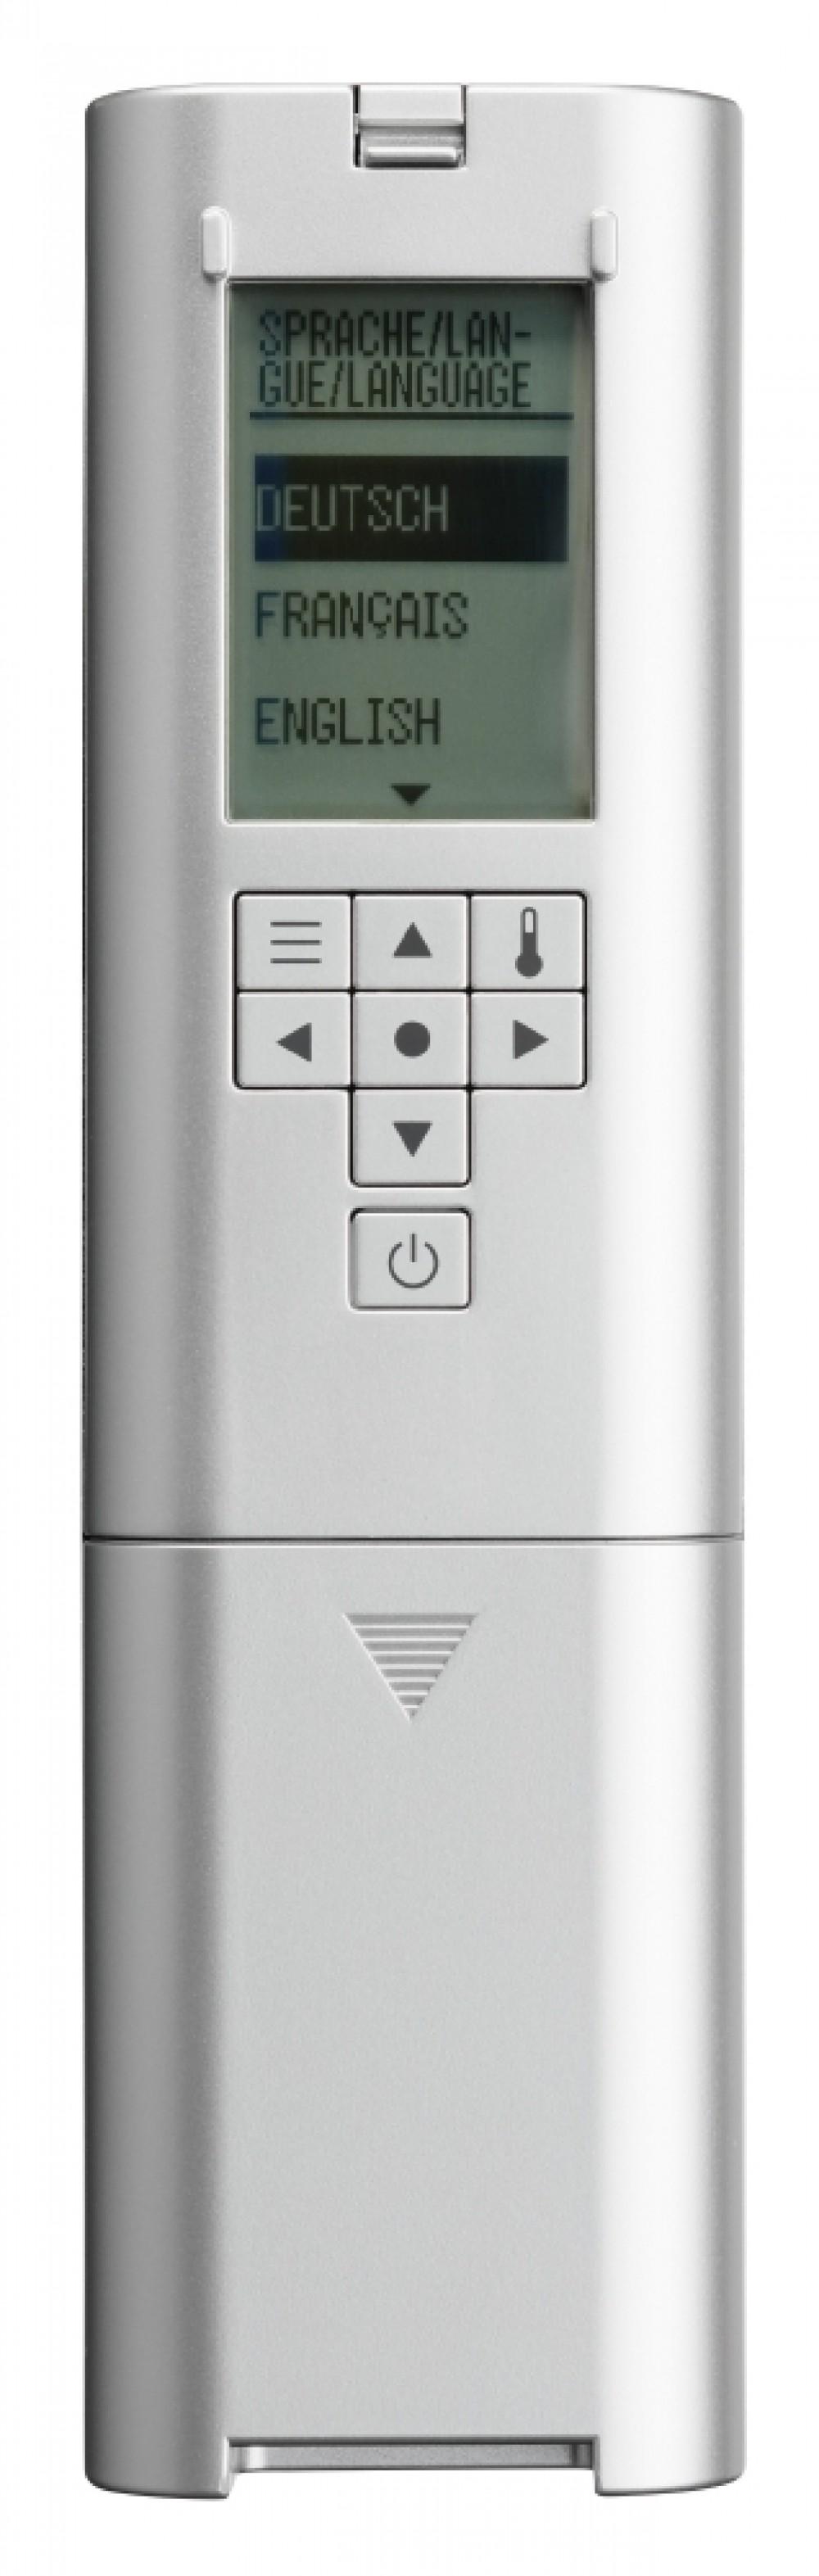 washlet rw toto auto flush remote control uk